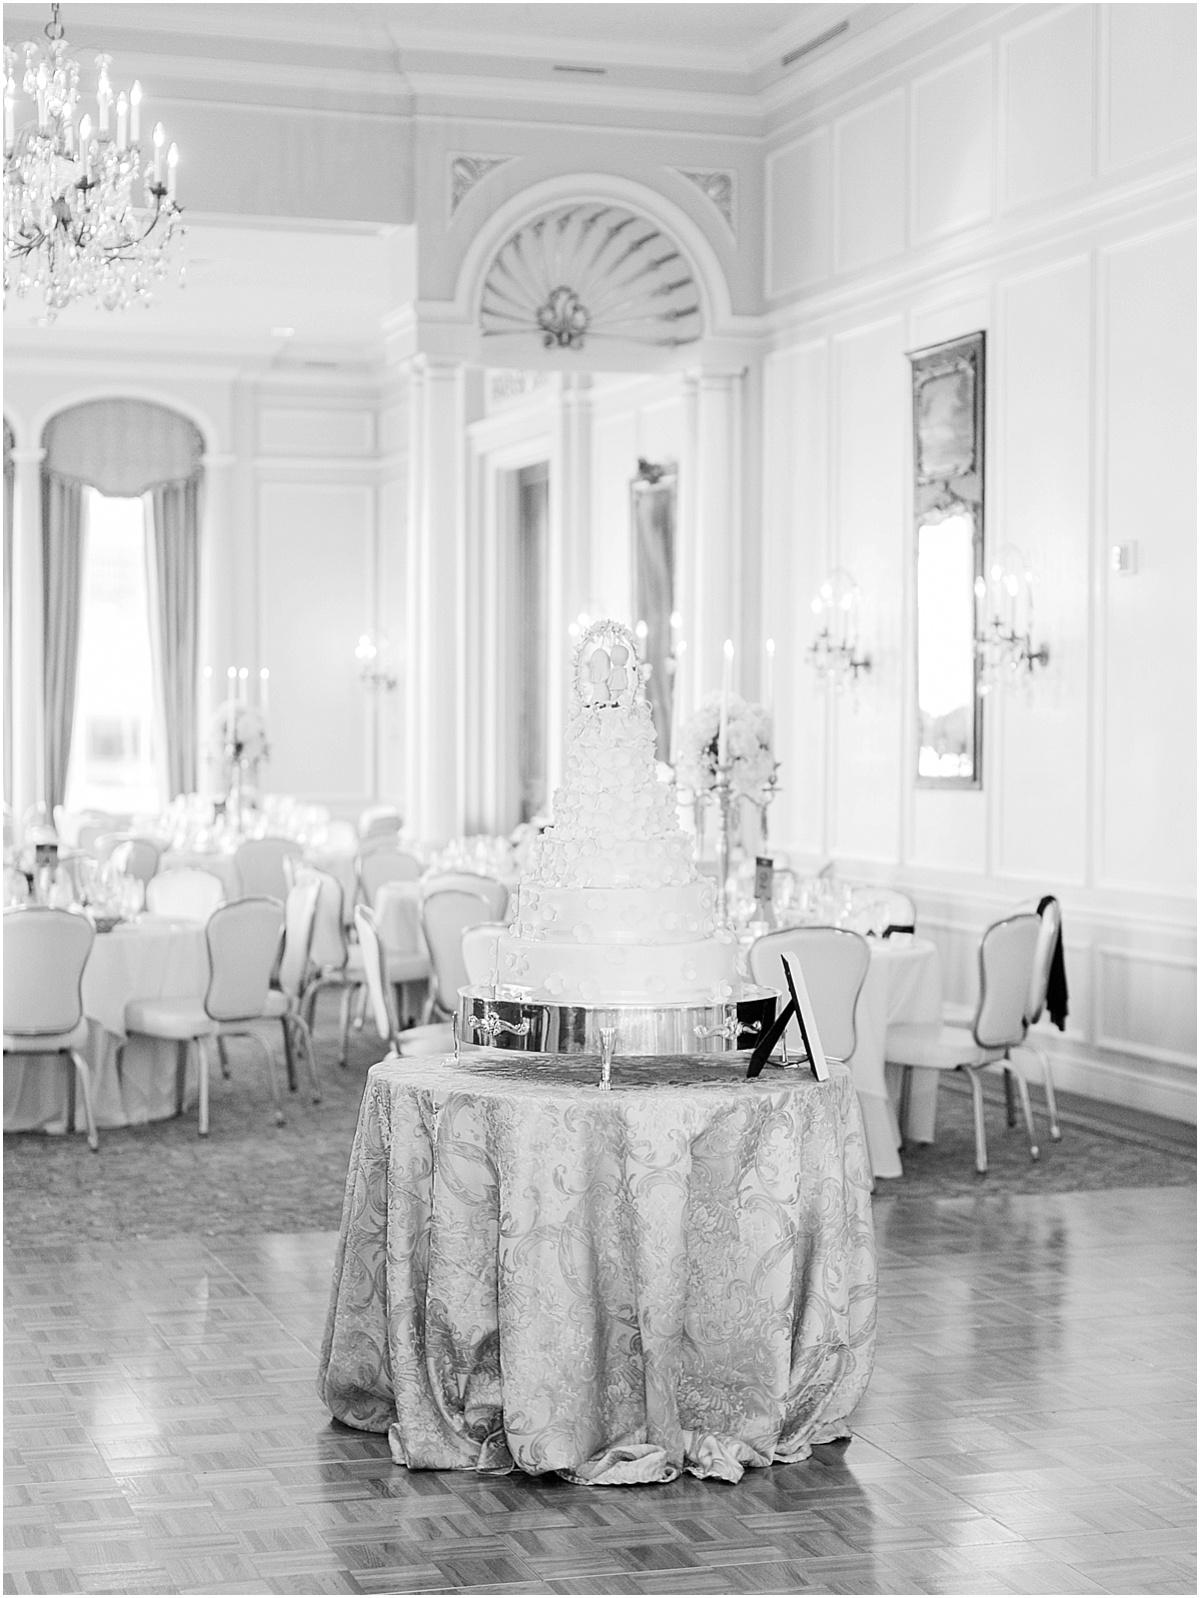 St_Louis_Wedding_Fine_Art_Film_Photographer_Jordan_Brittley_(www.jordanbrittley.com)_0037.jpg